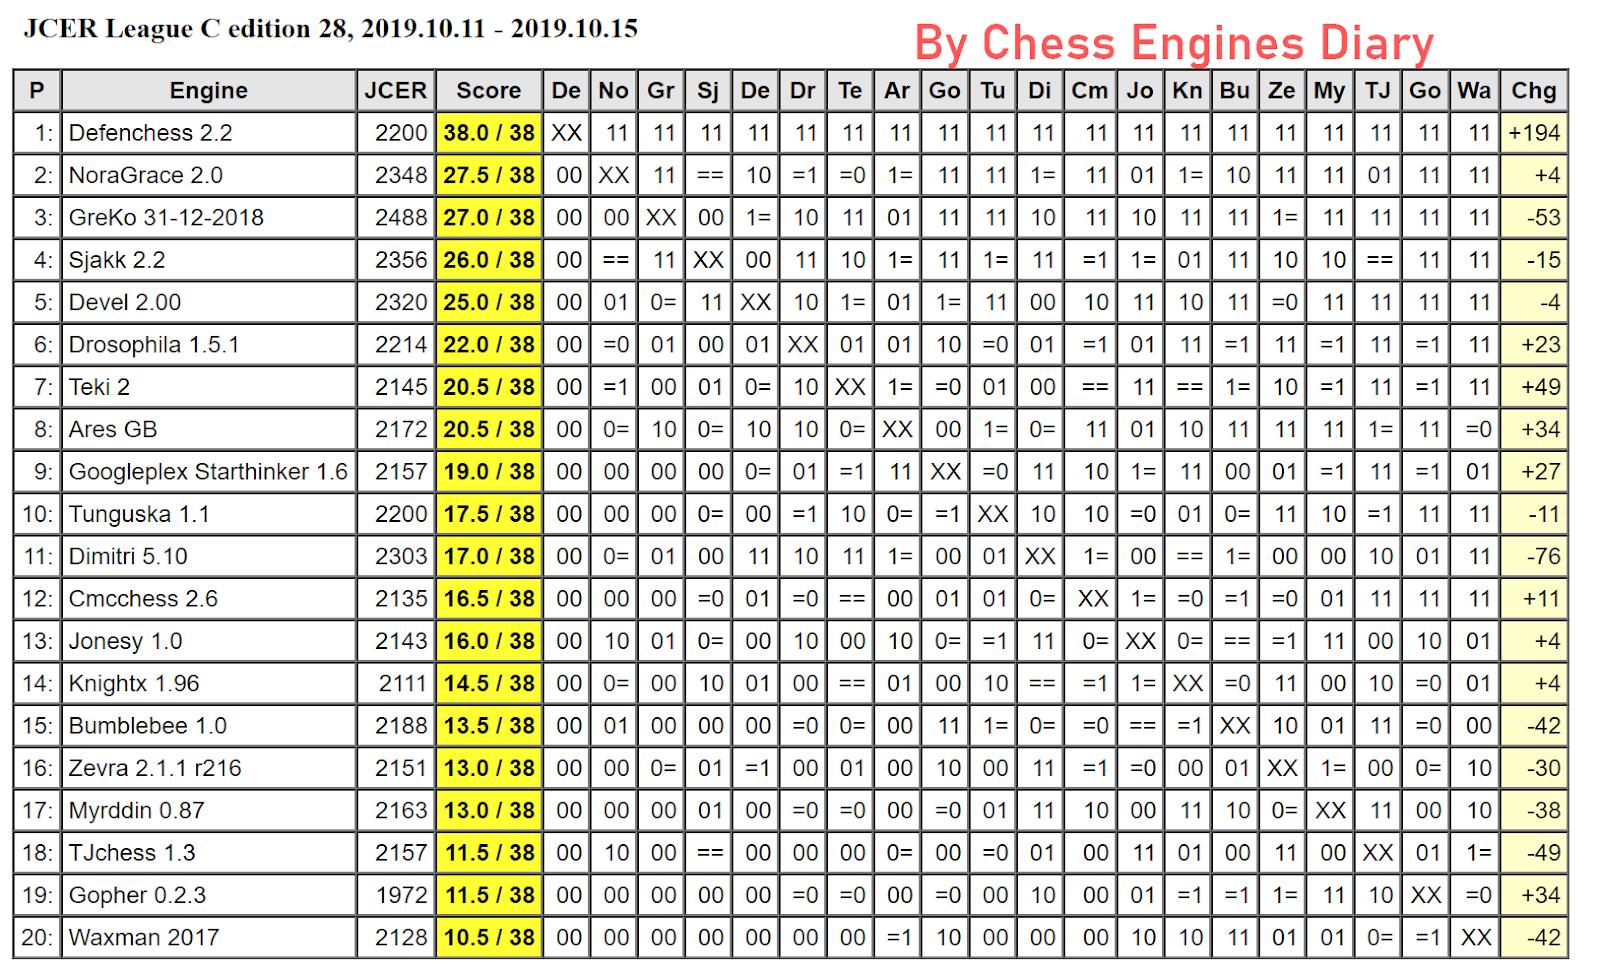 JCER (Jurek Chess Engines Rating) tournaments - Page 18 2019.10.11.LeagueC.ed28Scid.html